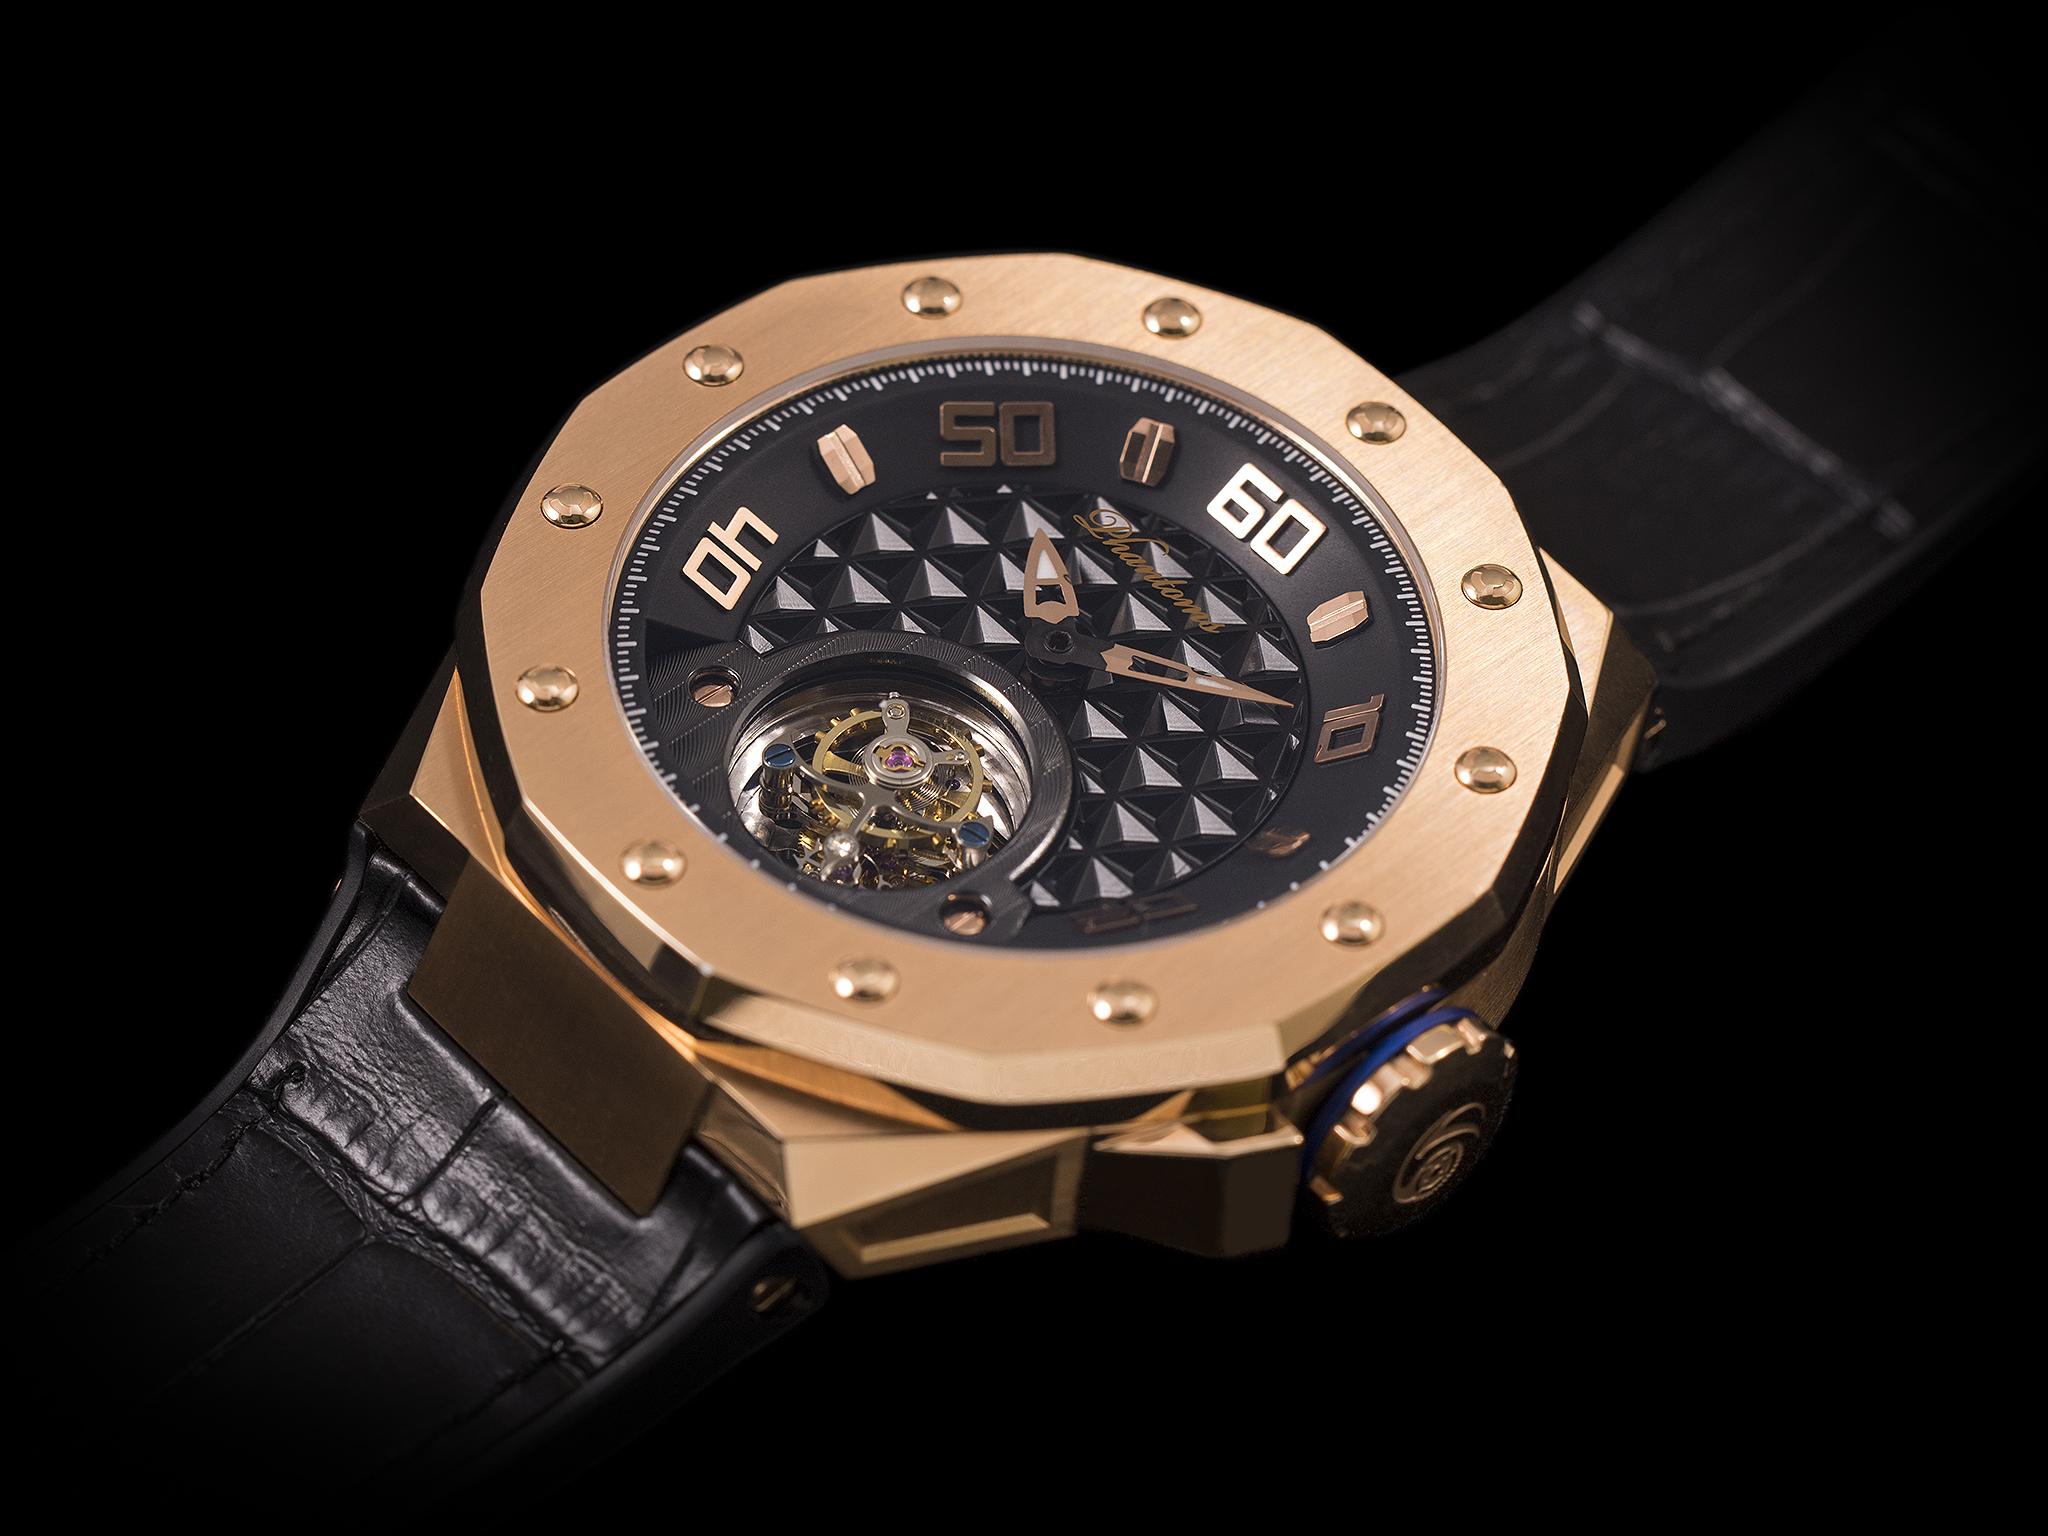 Phantoms Saintly Shield Flying Tourbillon Mechanical Watch